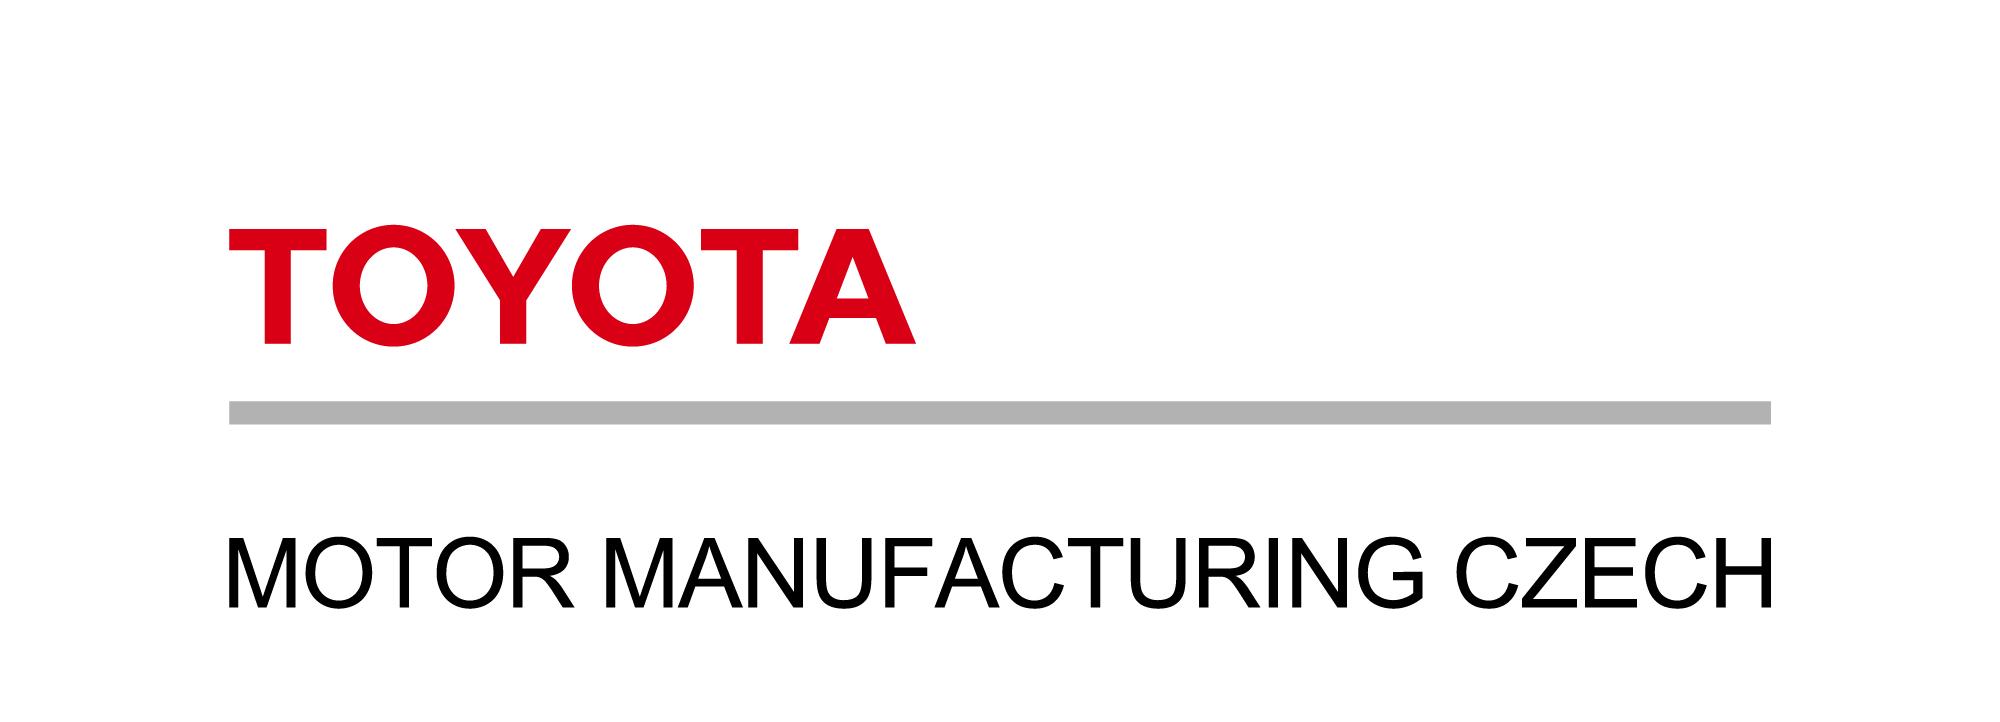 Toyota Motor Manufacturing Czech Republic, s.r.o. (TMMCZ)